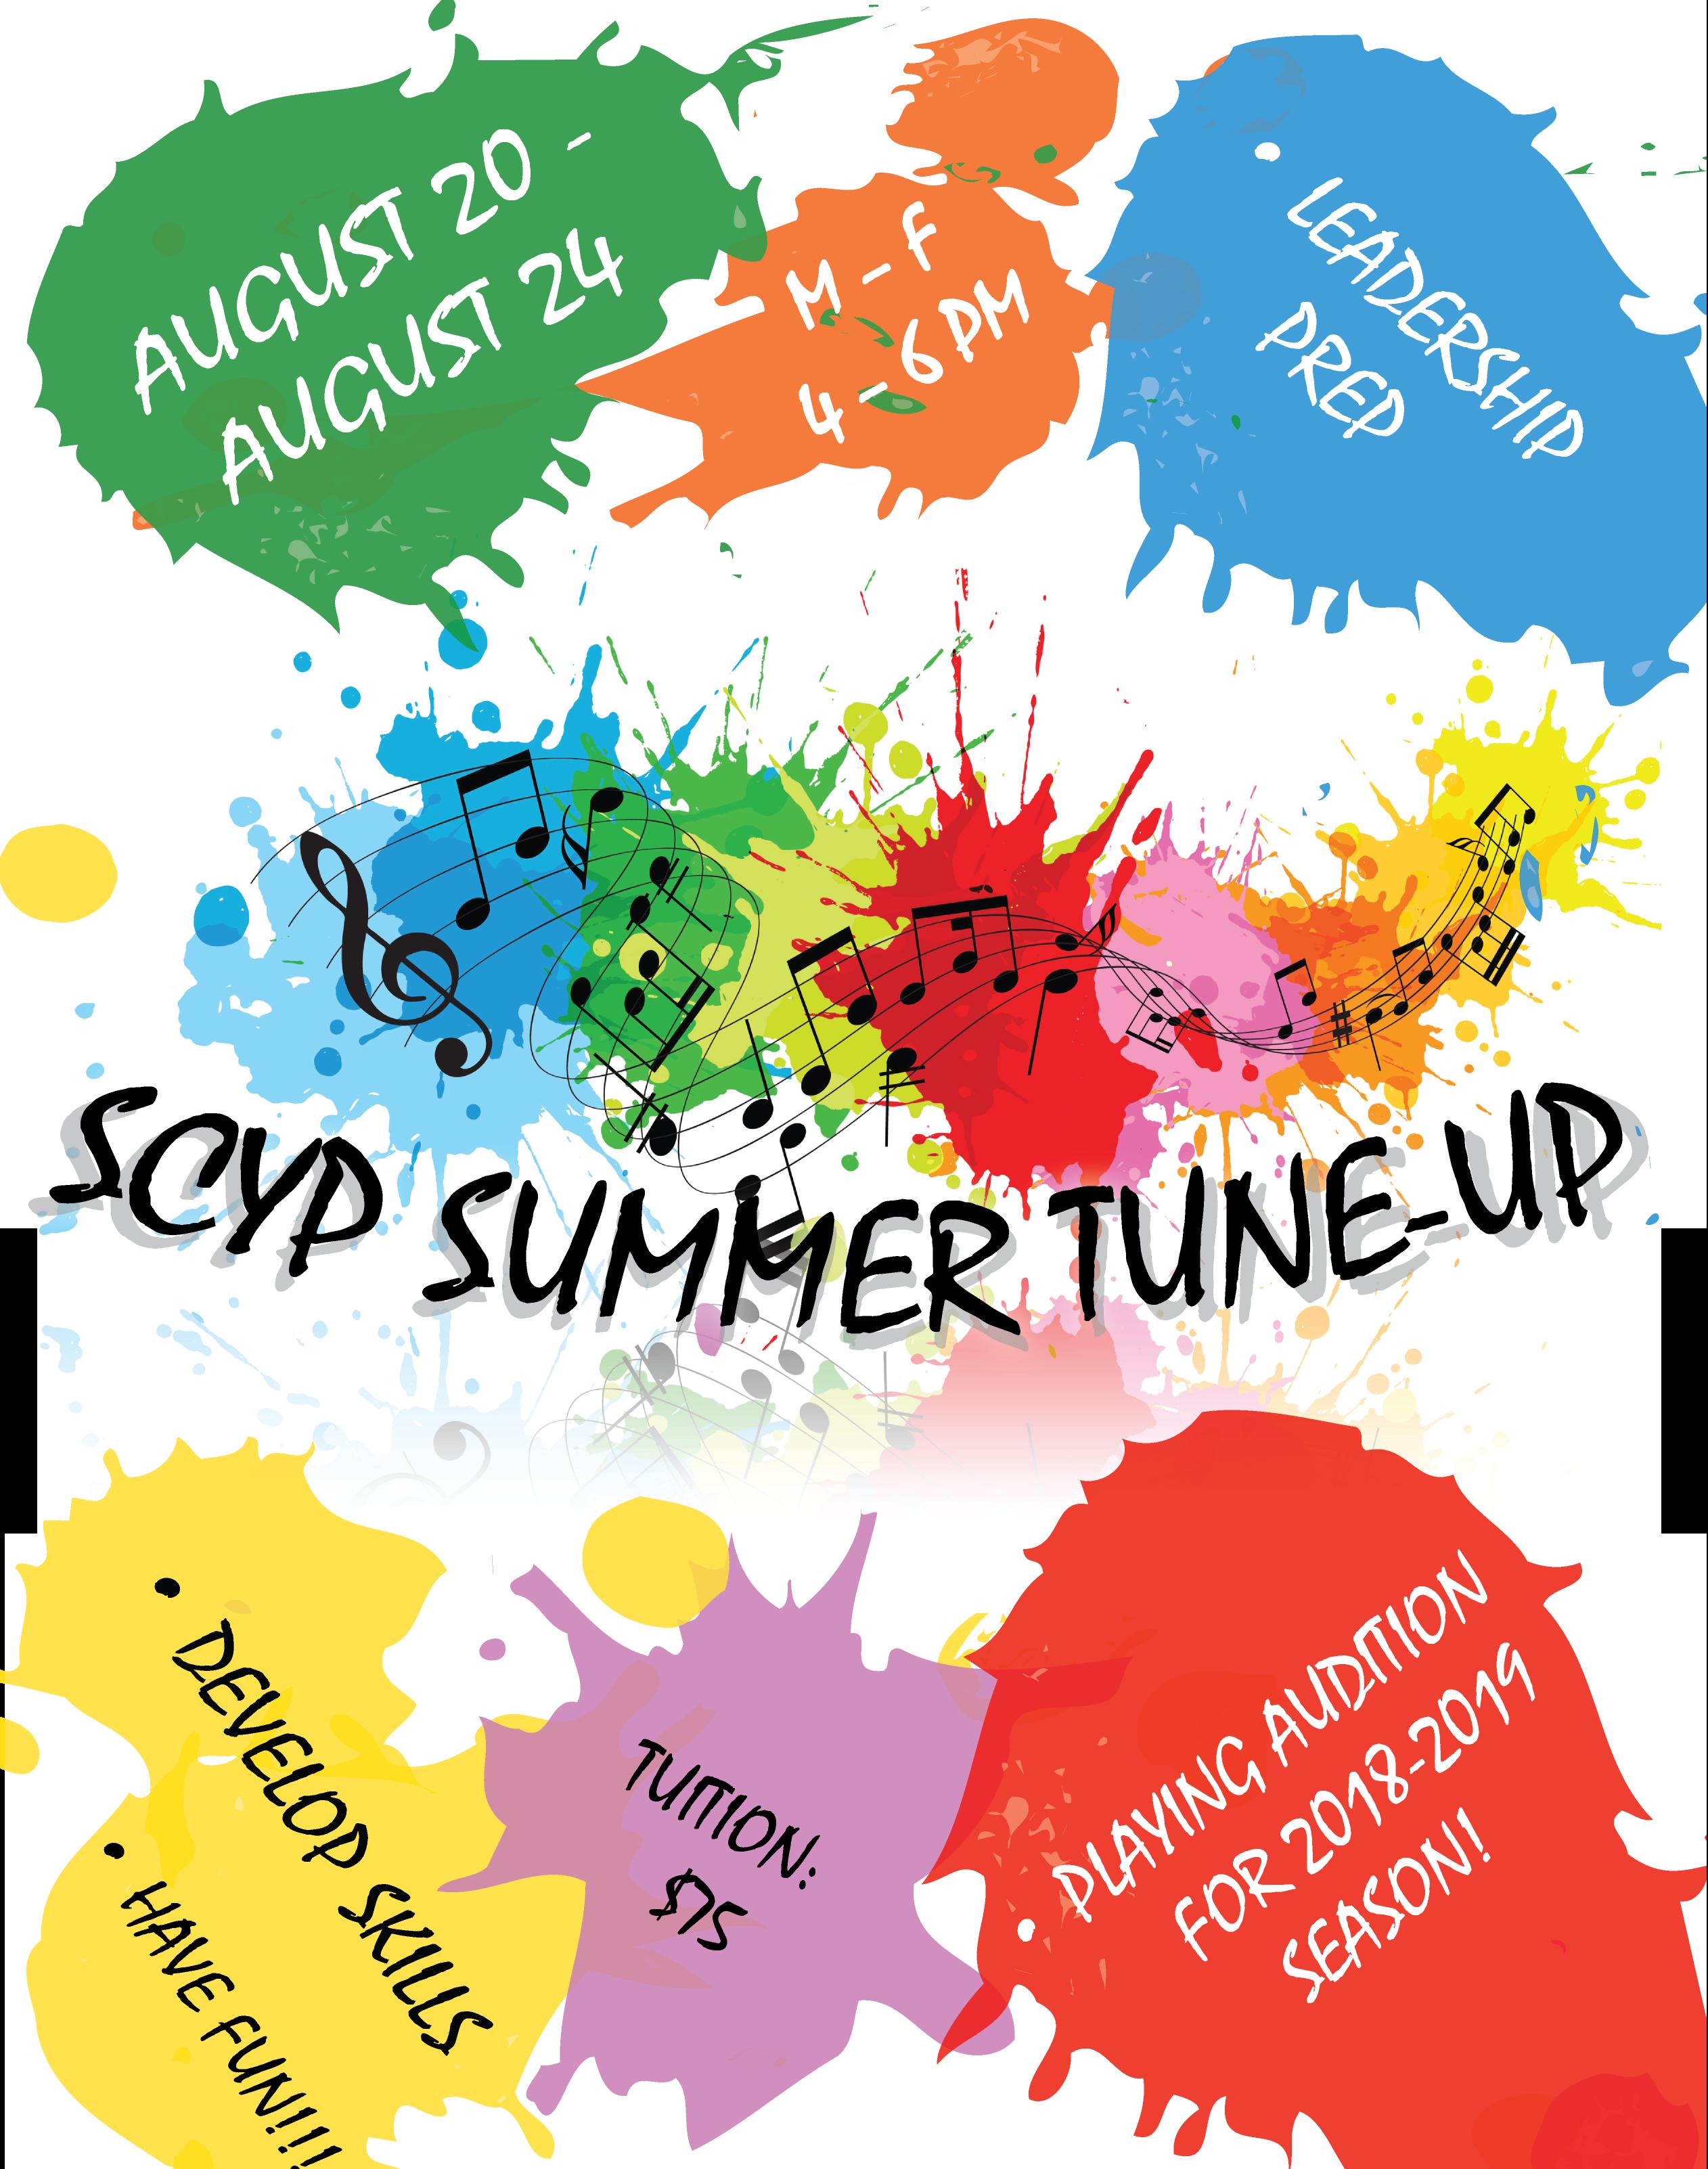 Summer Tune-Up Flyer 2018